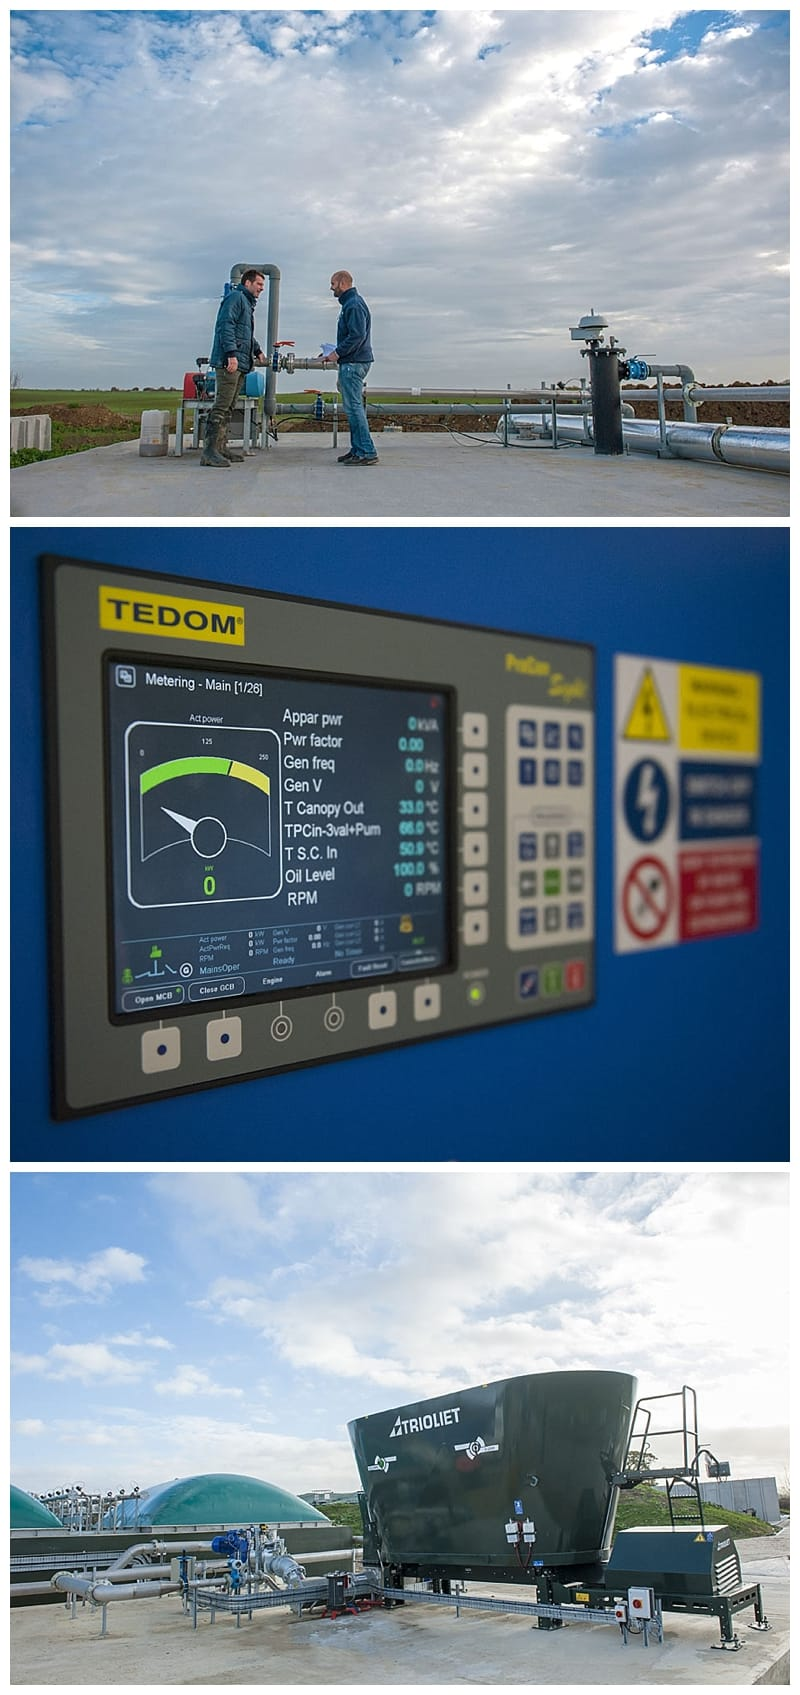 ad4energy-benjamin-wetherall-photography-0010